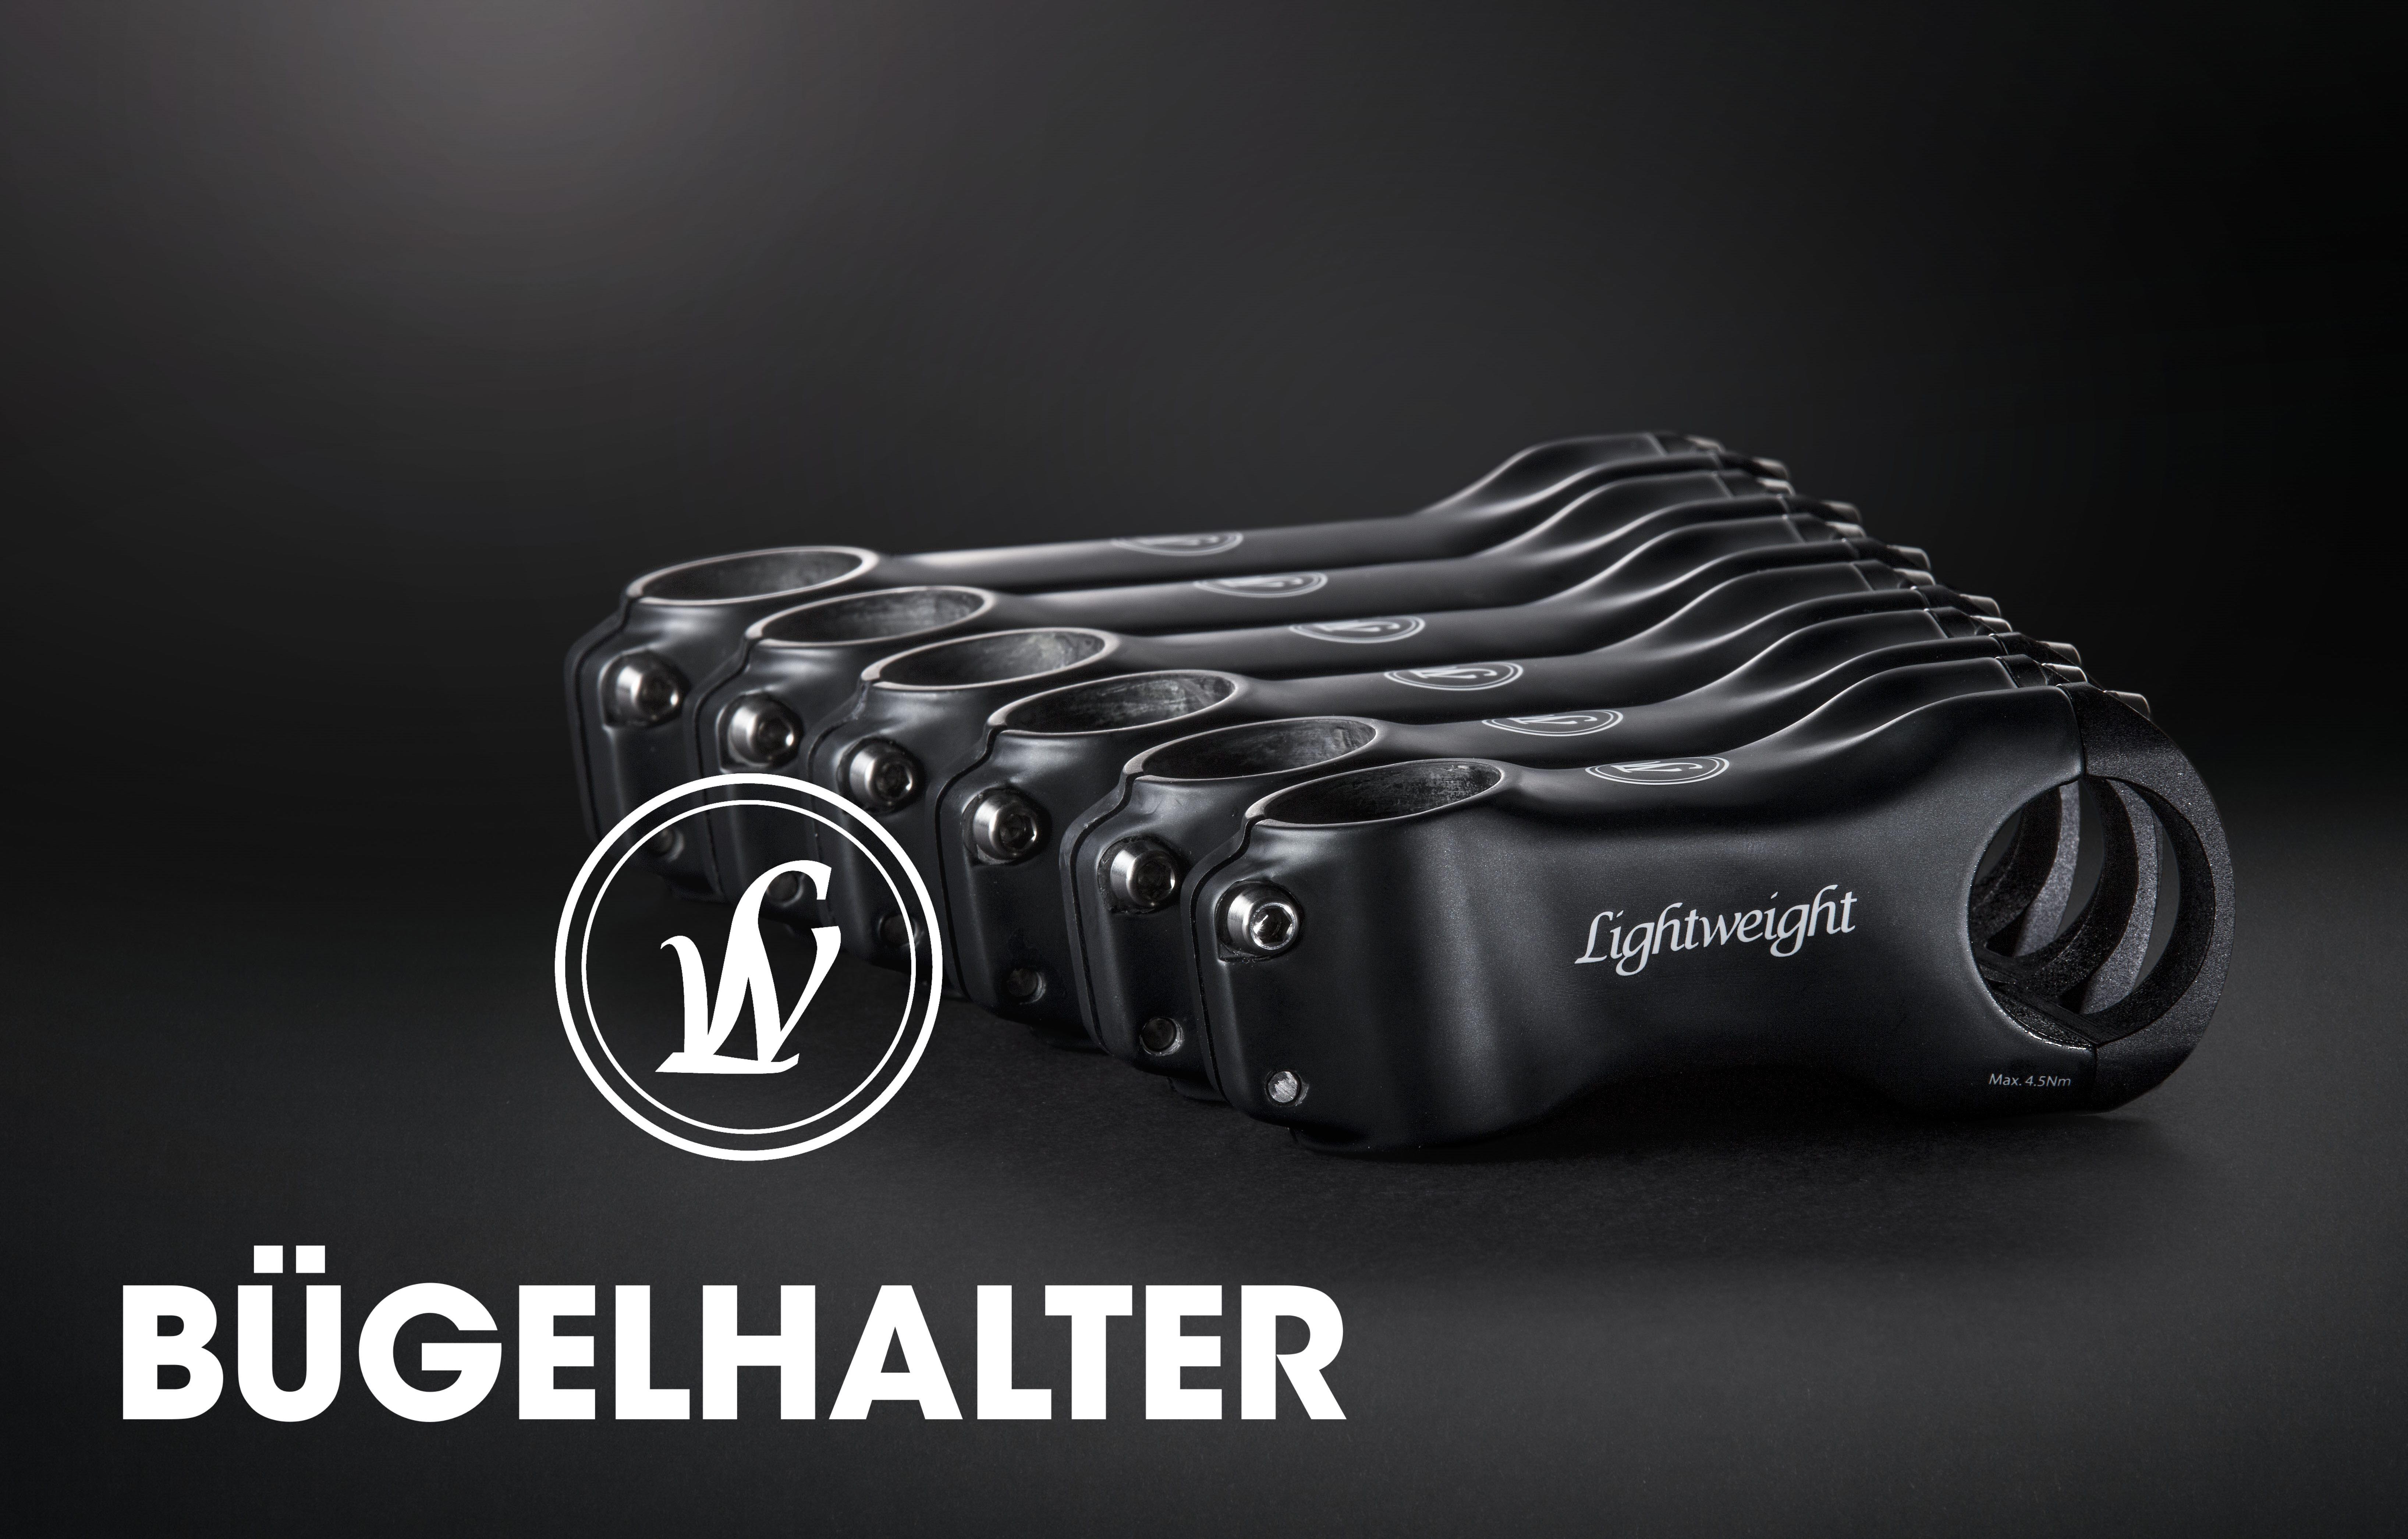 Lightweight Bügelhalter - Edler Carbon-Vorbau